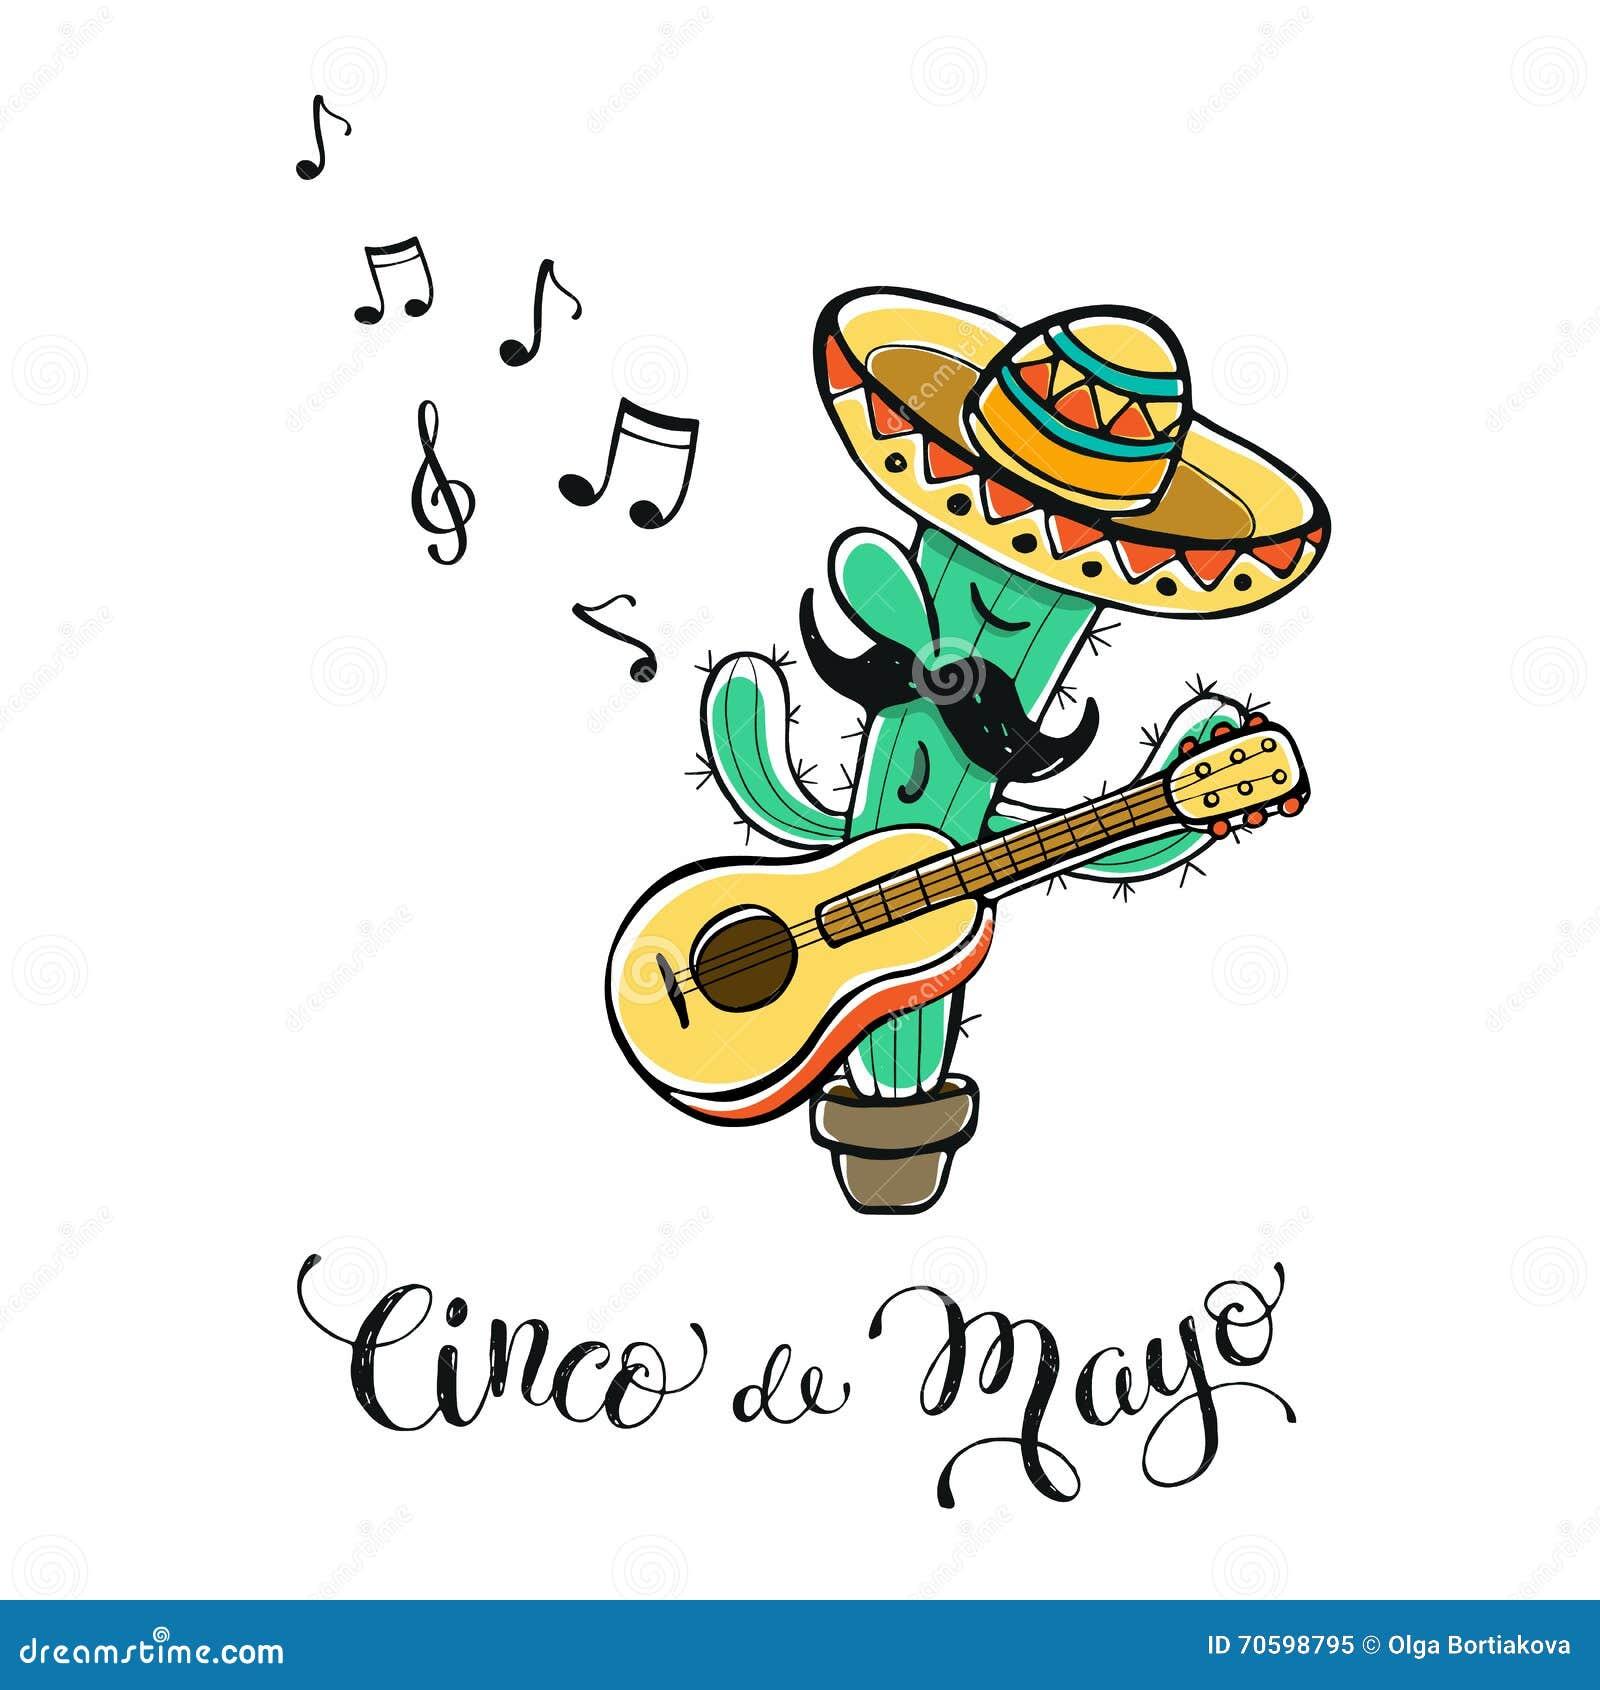 Cinco de Mayo illustration stock vector. Illustration of america ...